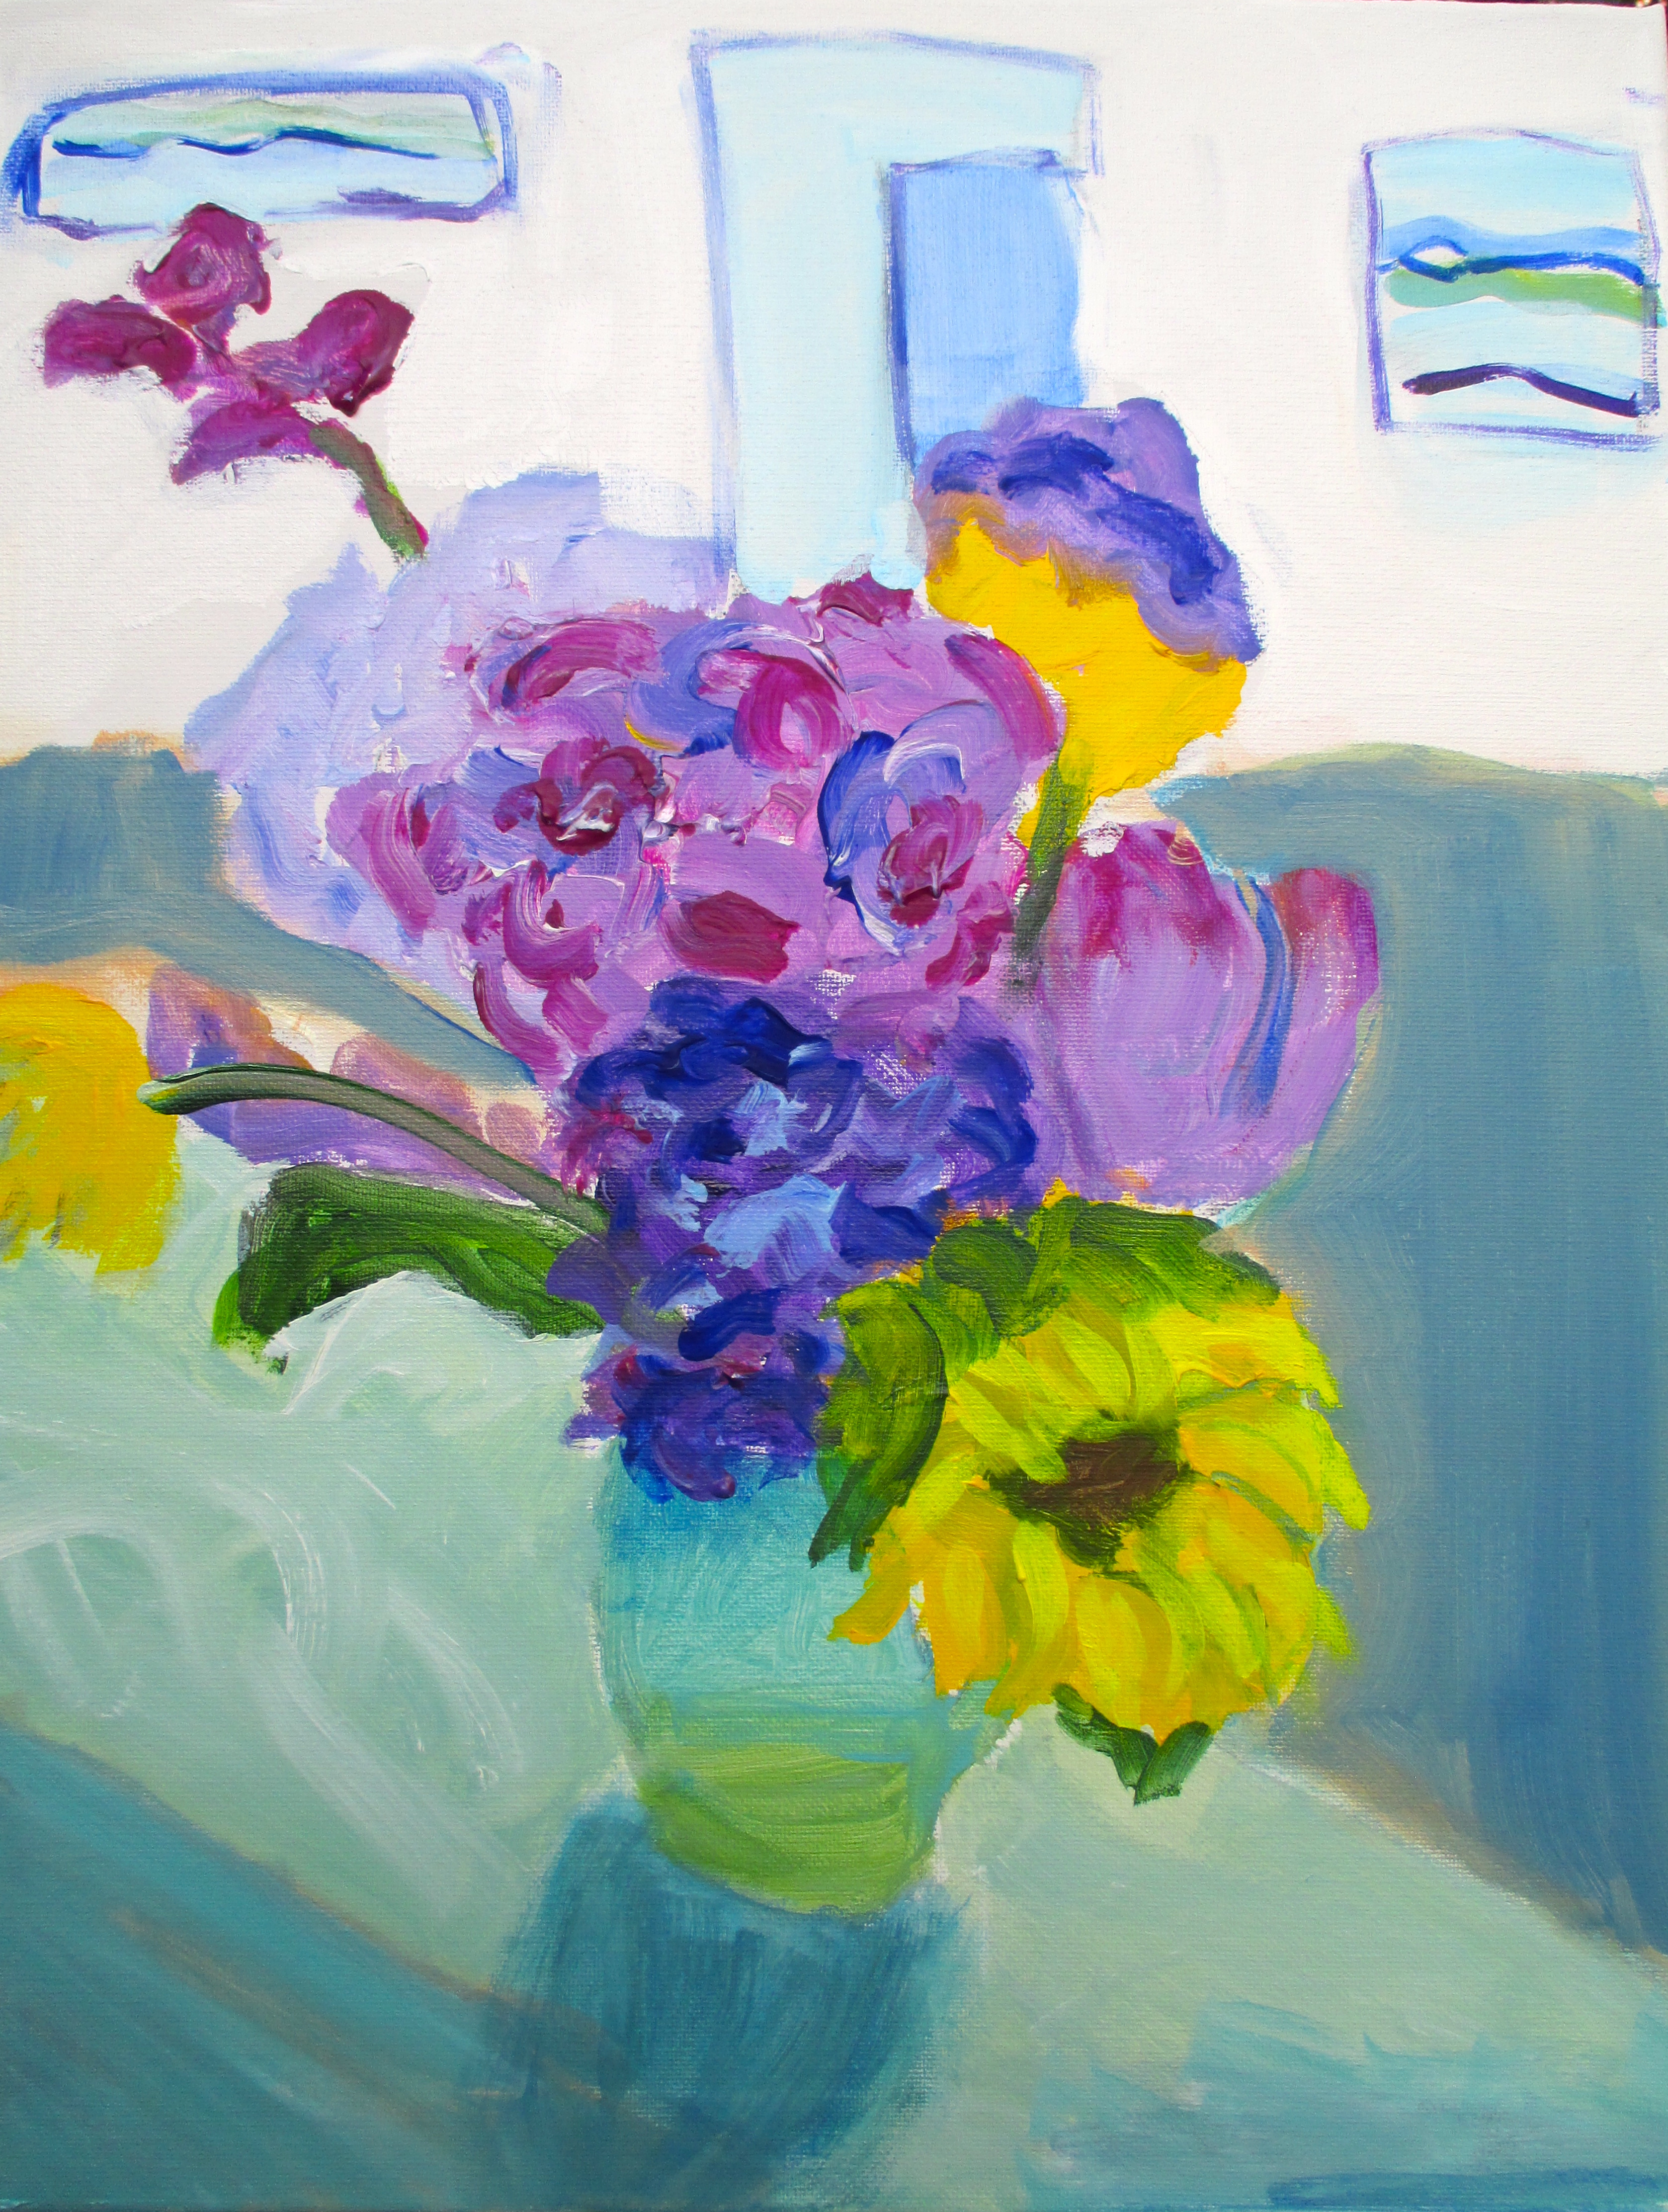 enhanced flowers on green table.jpg